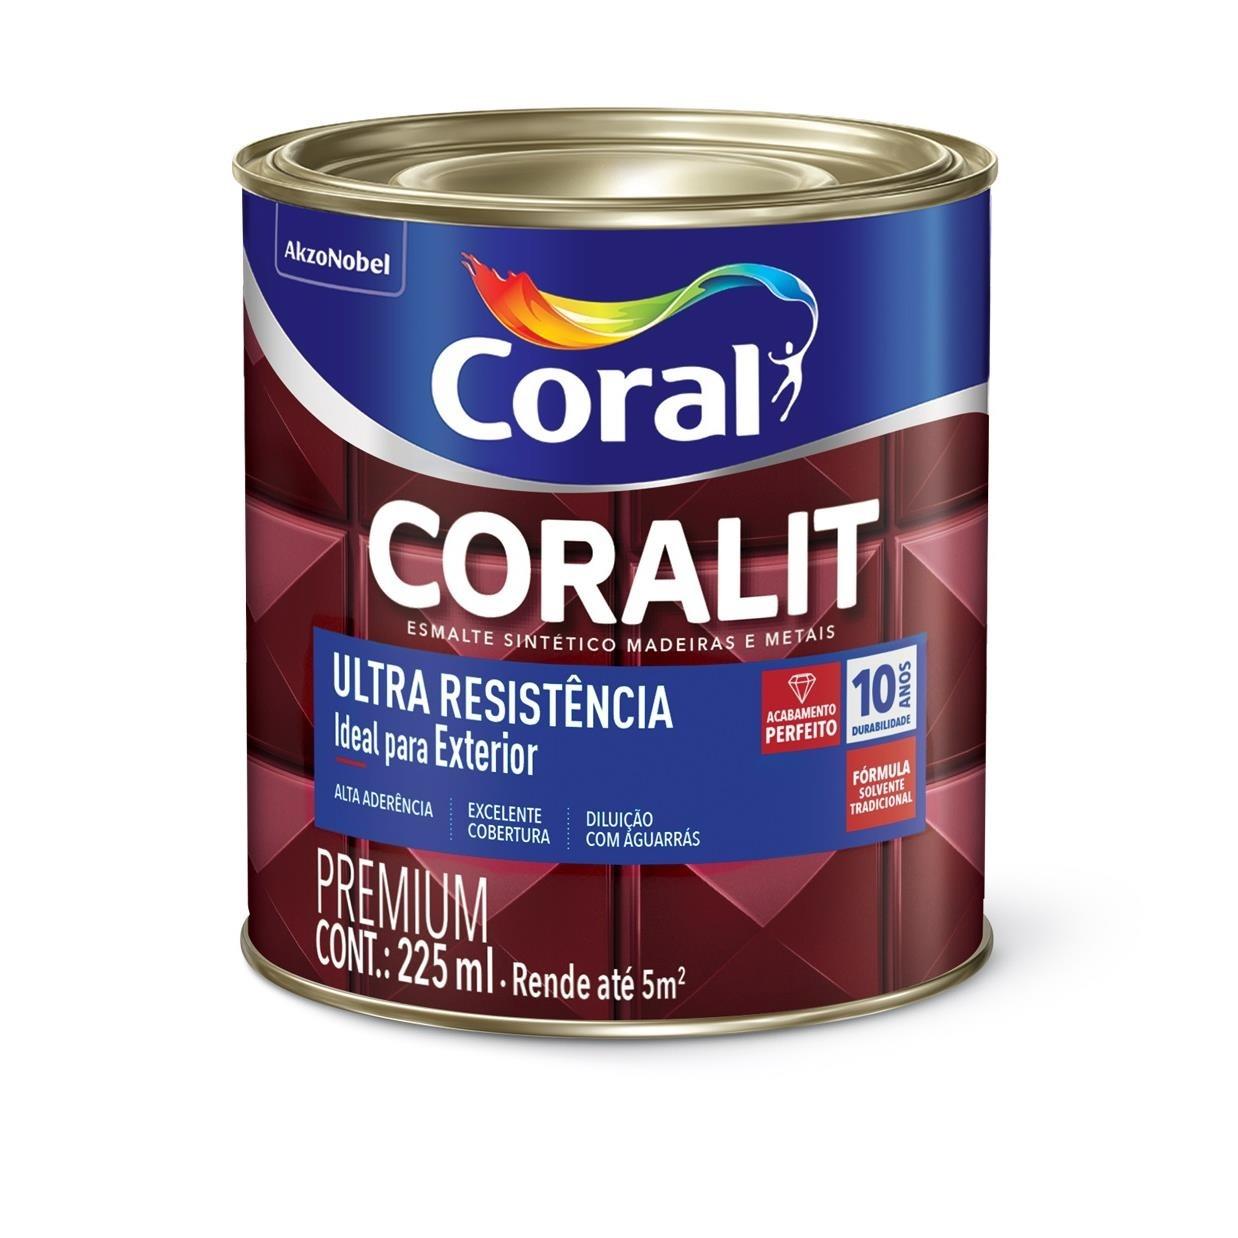 Tinta Esmalte Sintetico Alto brilho Premium 02L - Branco Neve - Coralit Coral